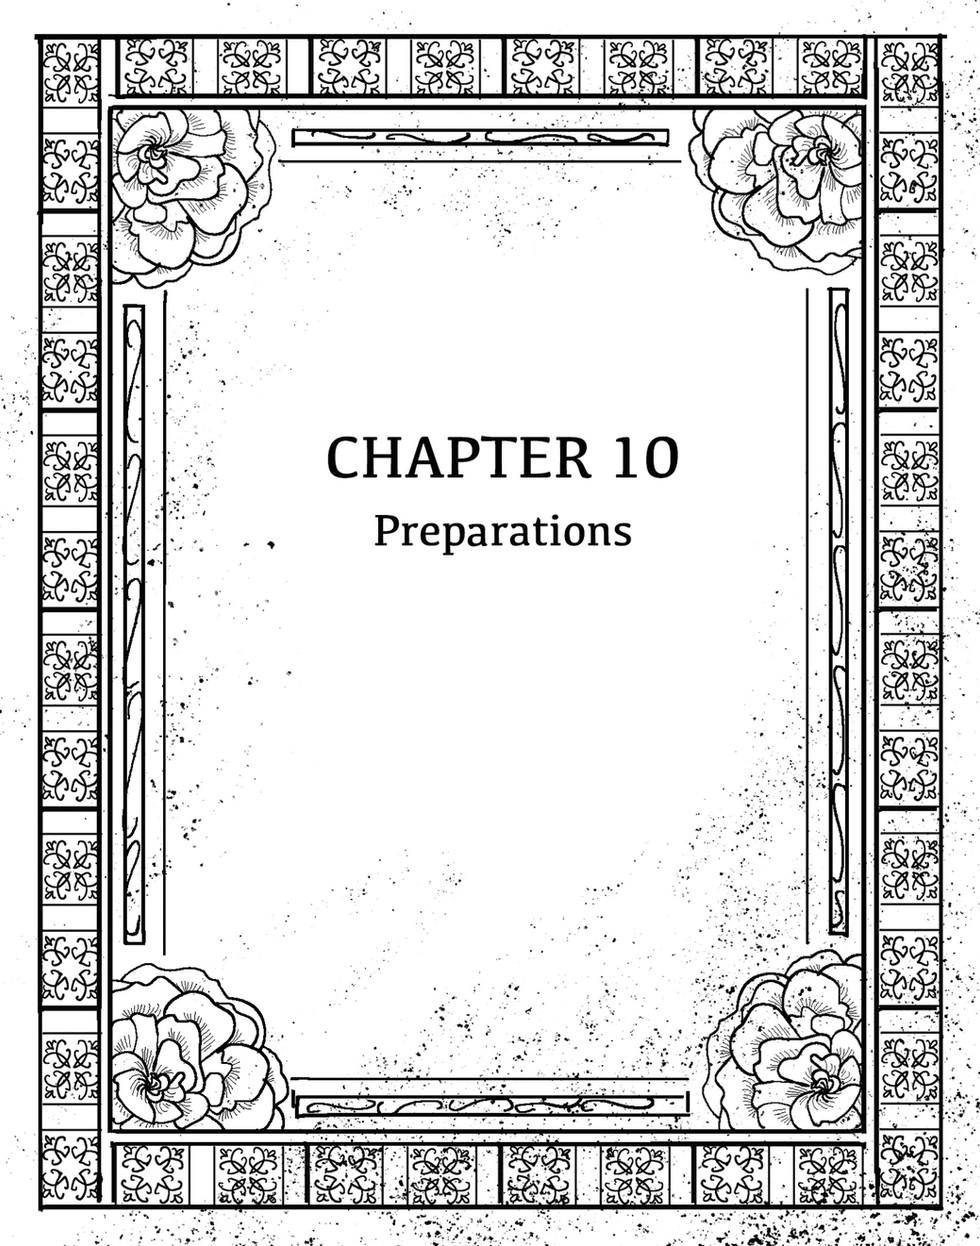 Amnesia_ChapterCard_10.jpg